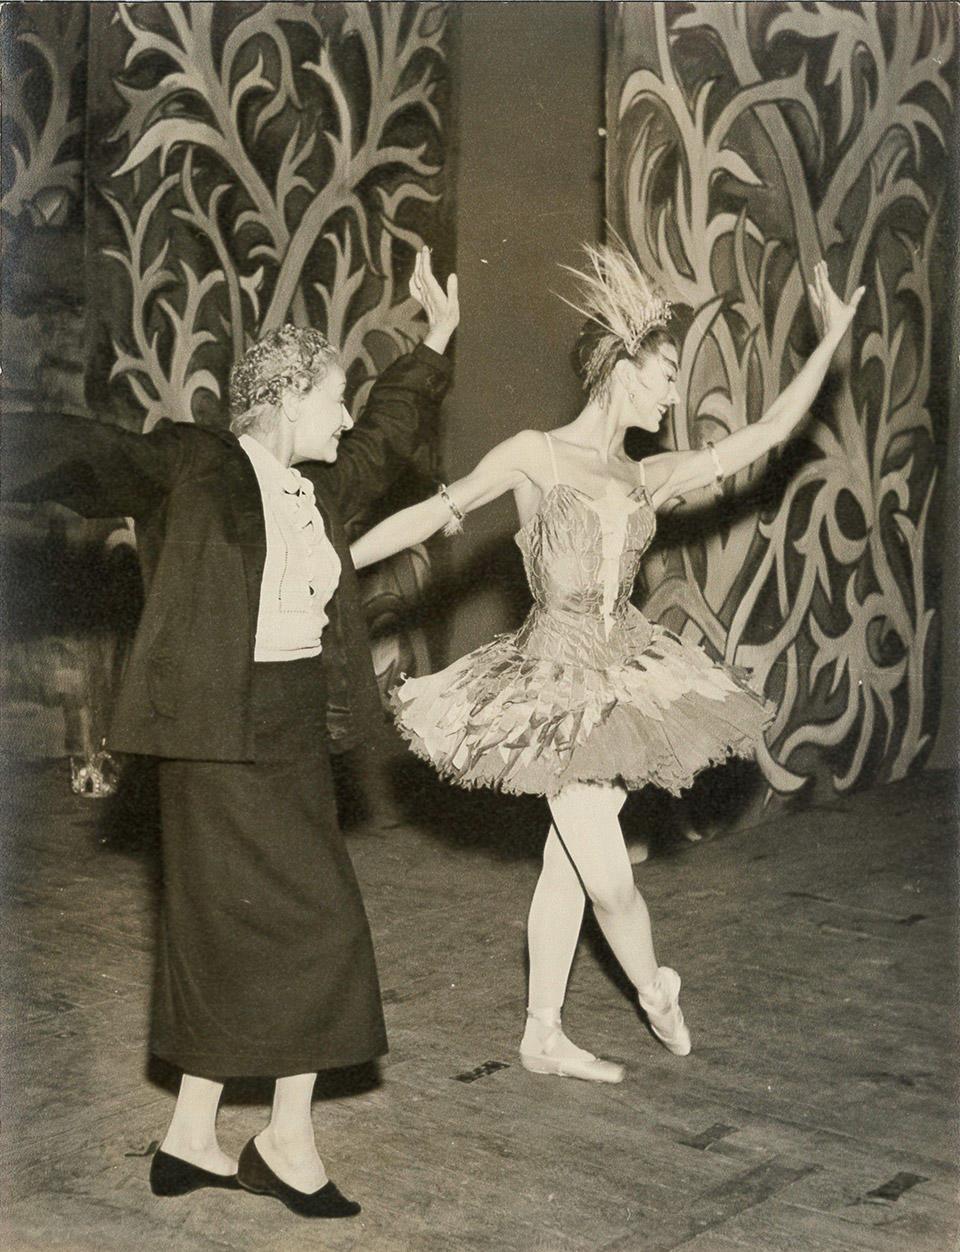 Karsavina-coaching-Fonteyn-in-role-of-The-Firebird.-Photo-by-Douglas-Elston,-1954.jpg